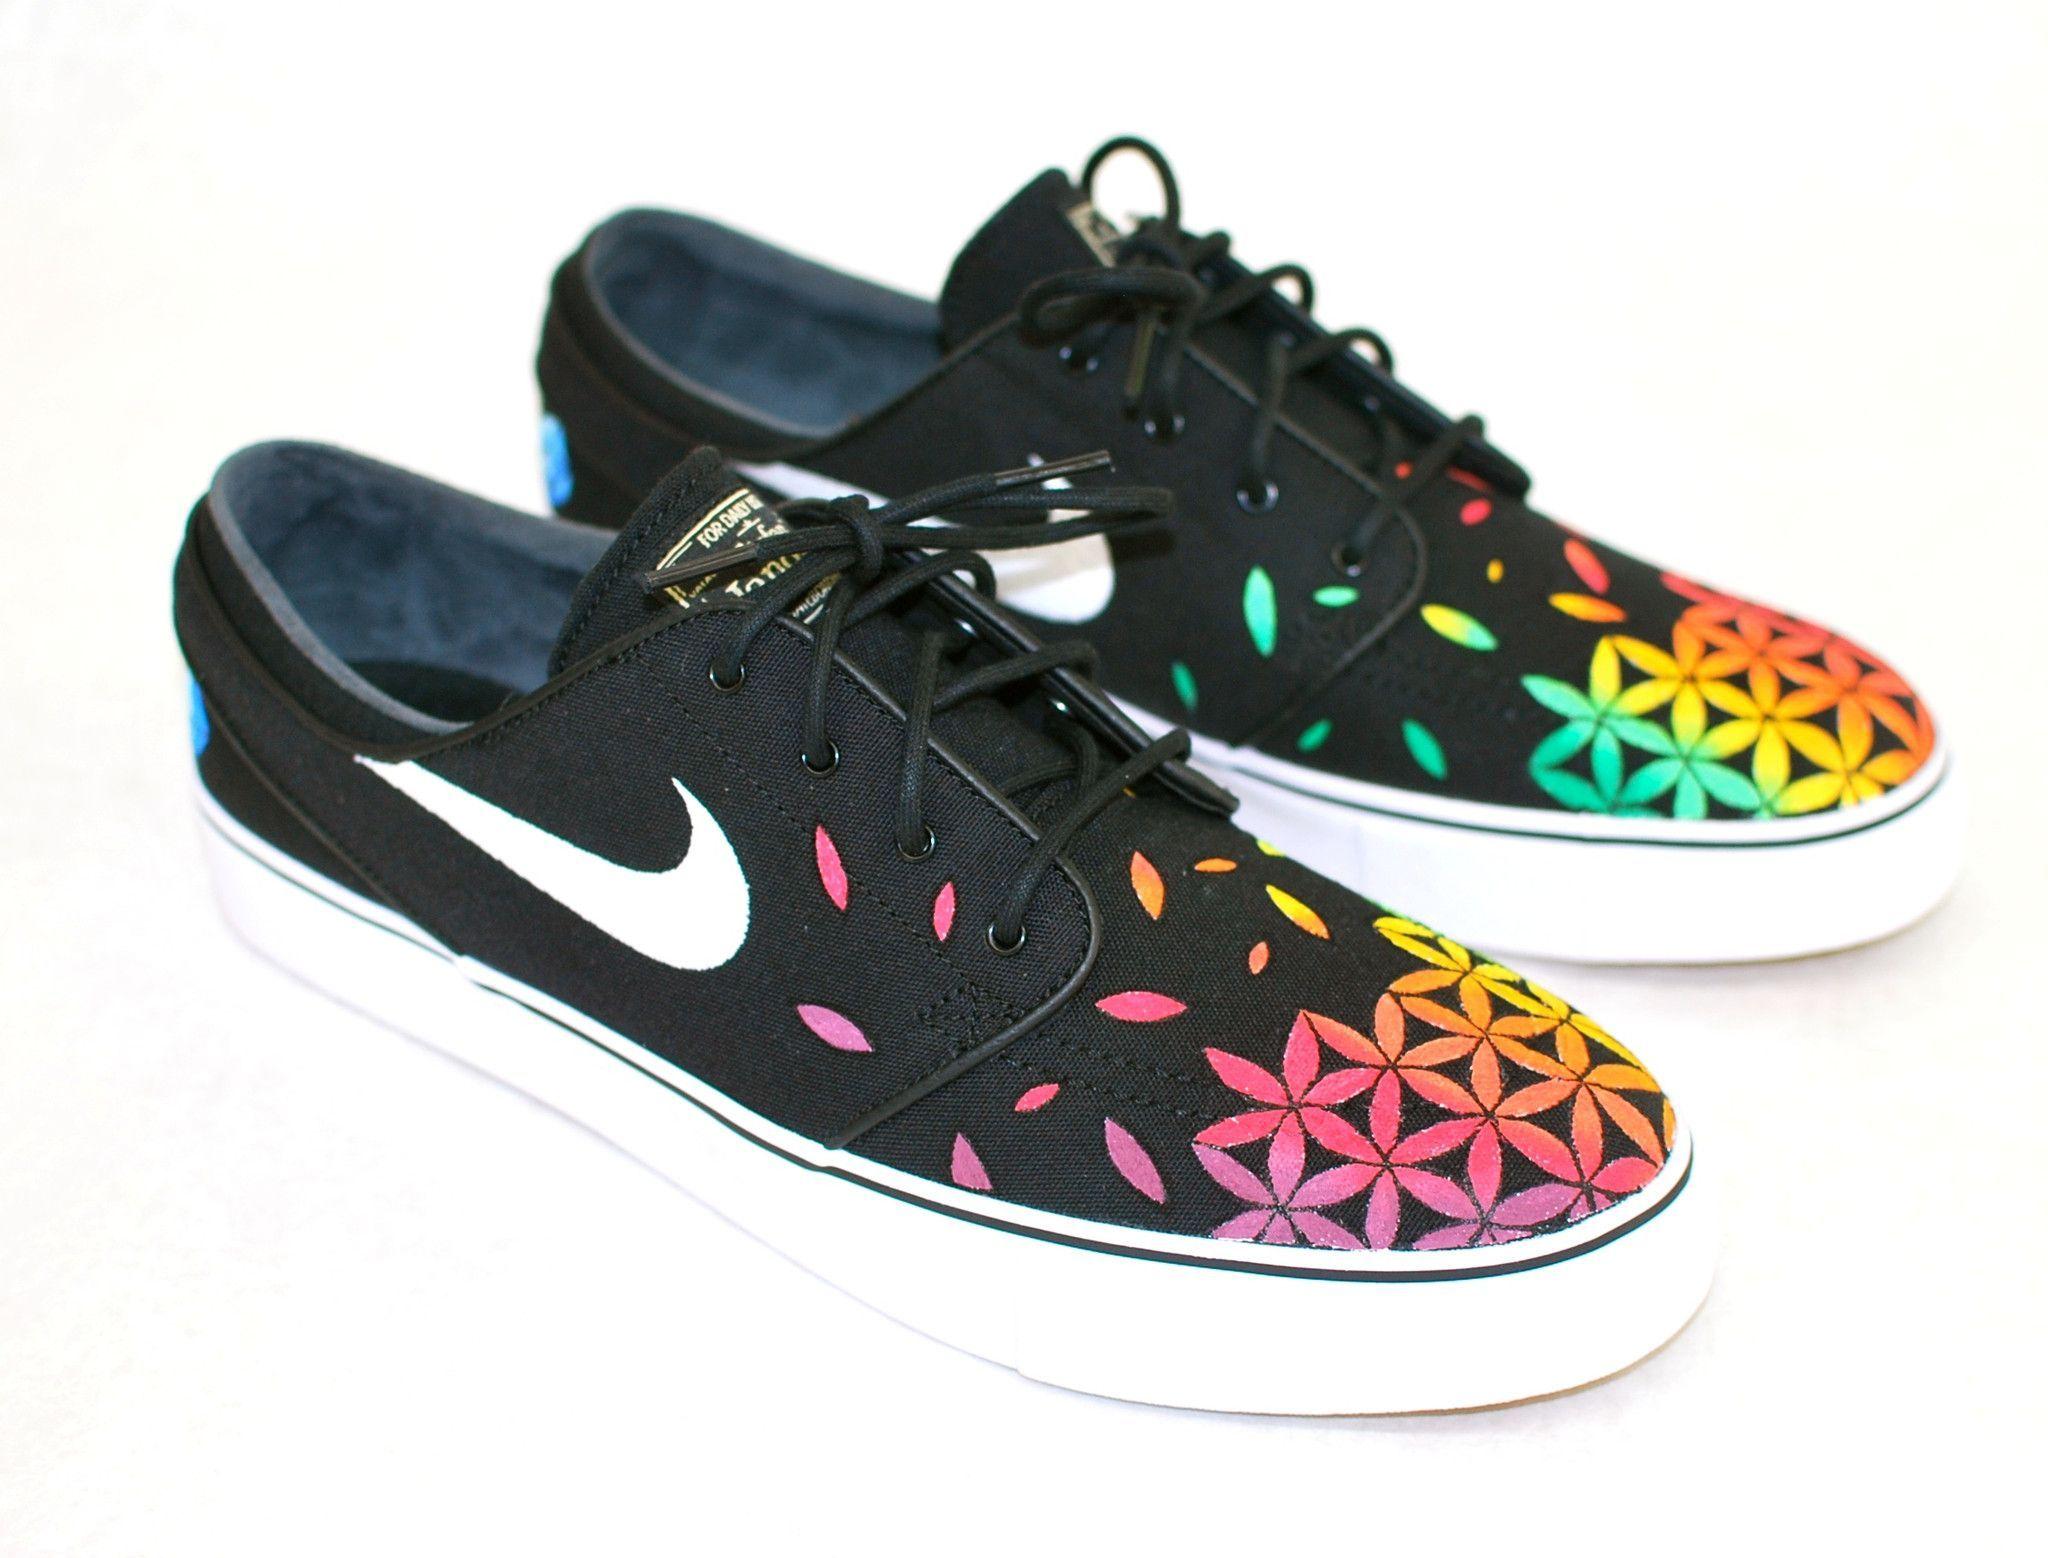 58f1b5cdbb90 Custom Hand Painted Nike Zoom Stefan Janoski Sneakers - Rasta Sacred  Geometry Flower of Life pattern